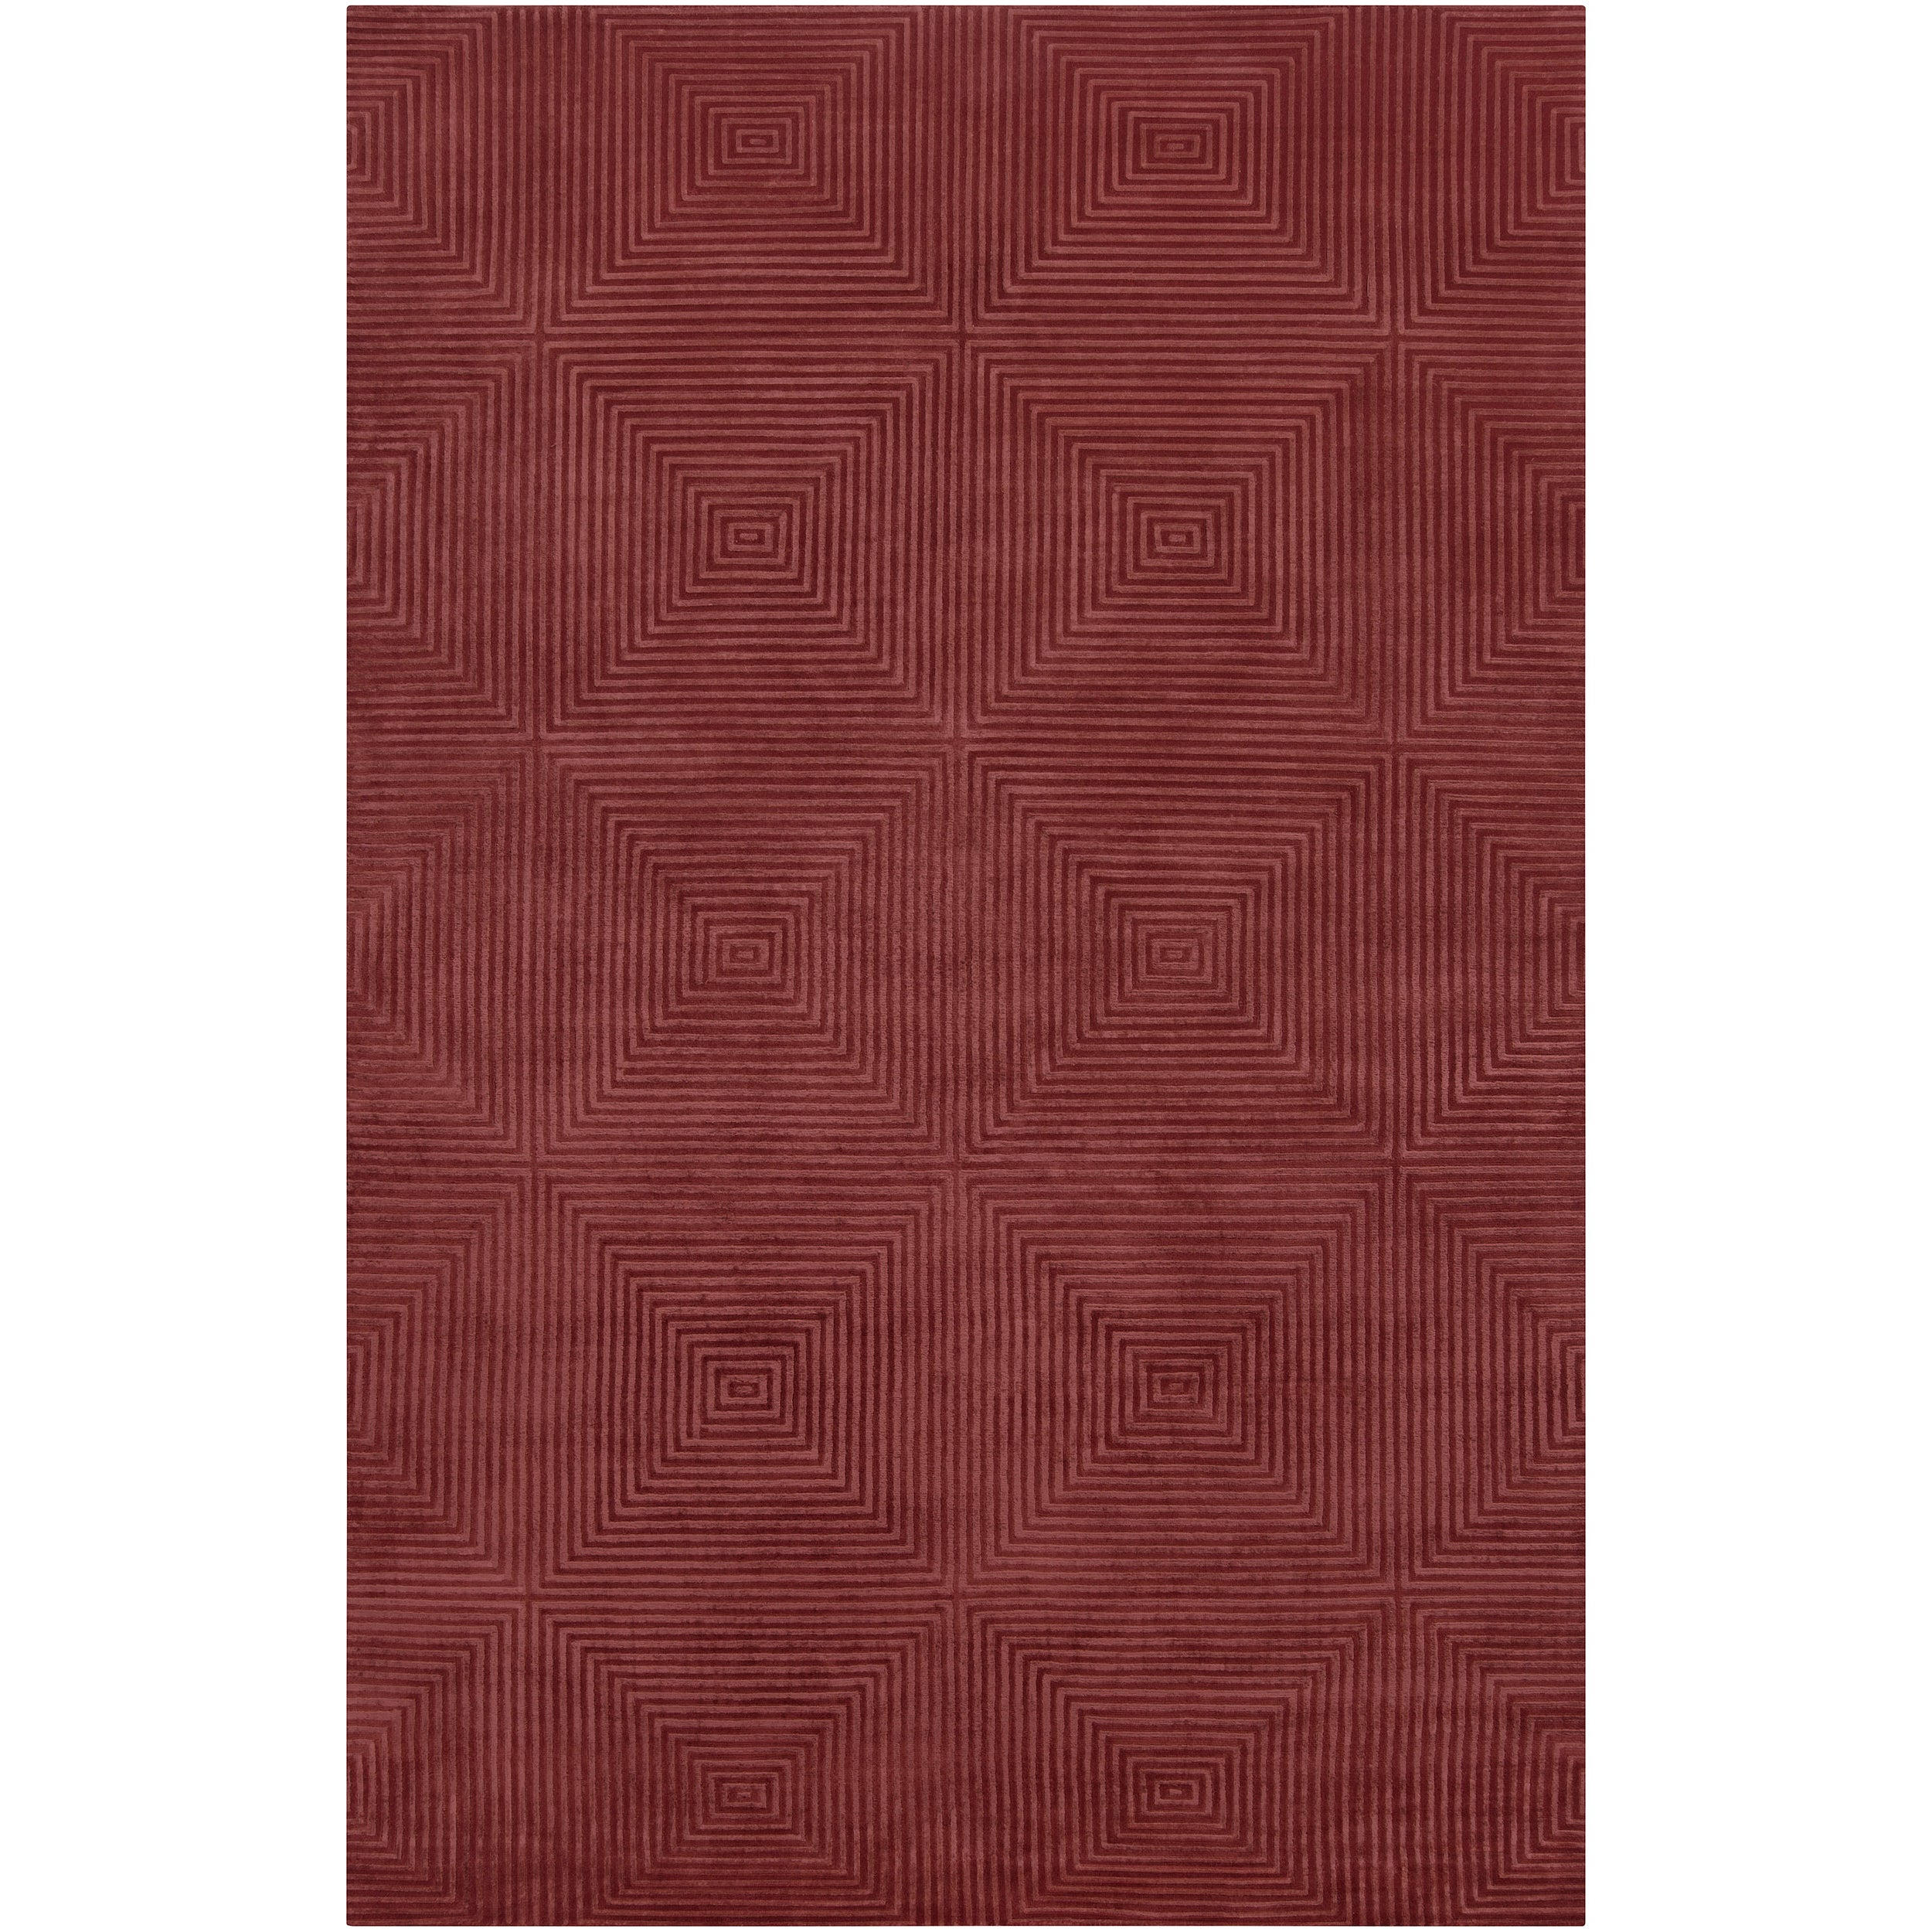 Hand-Knotted Serres Raspberry Geometric Wool Area Rug - 9' x 13'